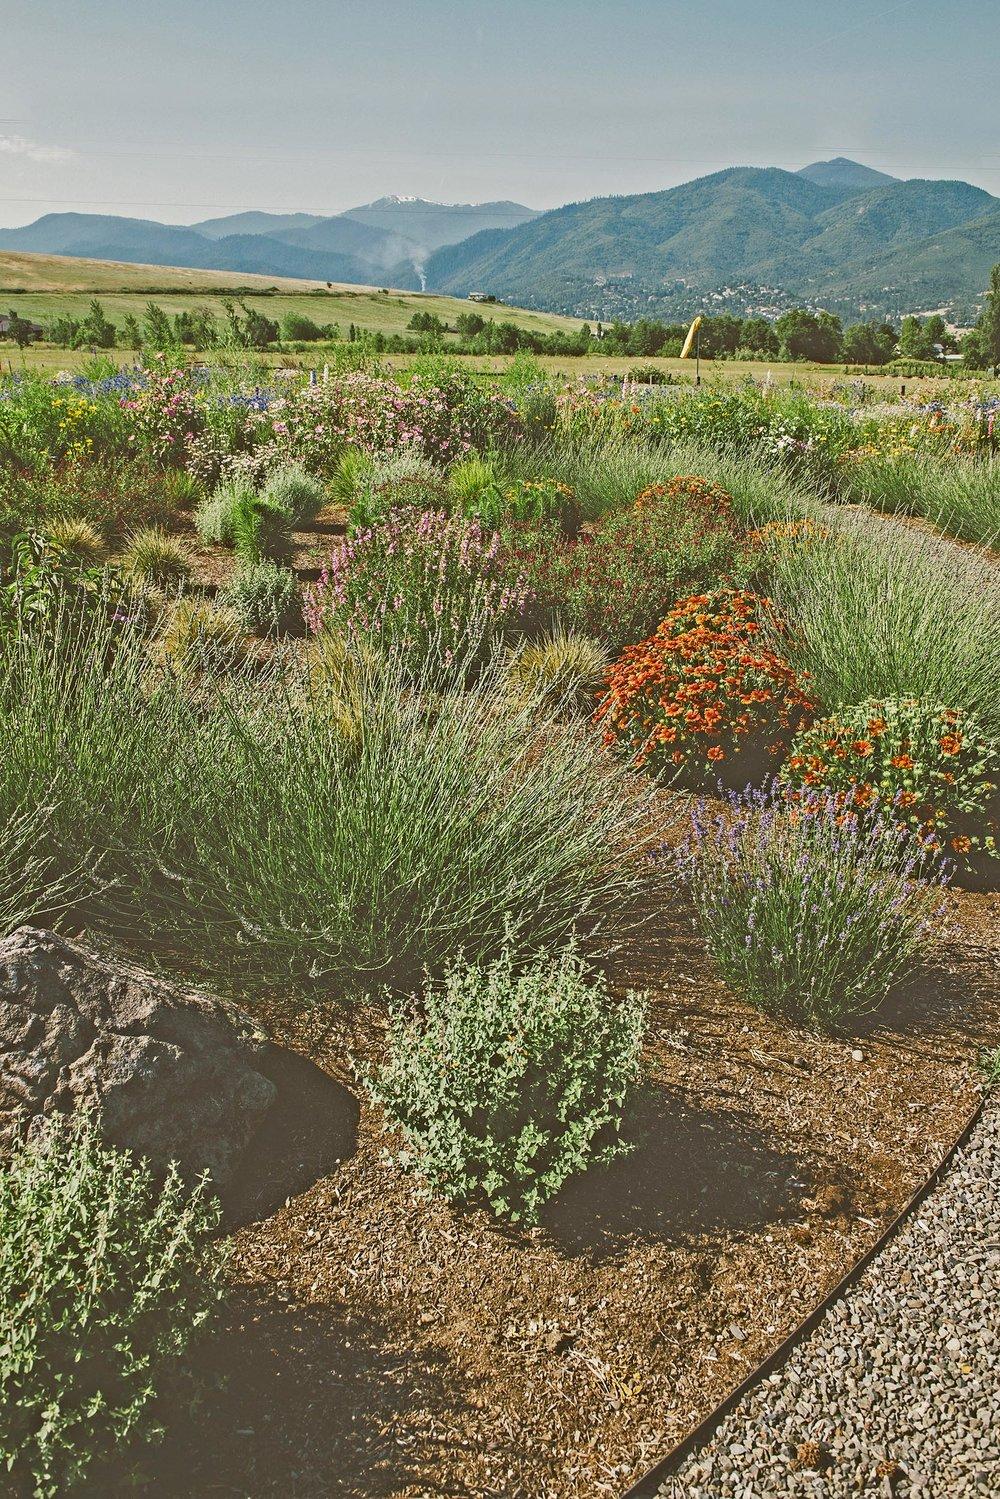 water-wise pollinator garden + gravel pathway + lavendula + red poppies + mixed flowering perennials + bee garden + butterfly garden + ashland oregon hills